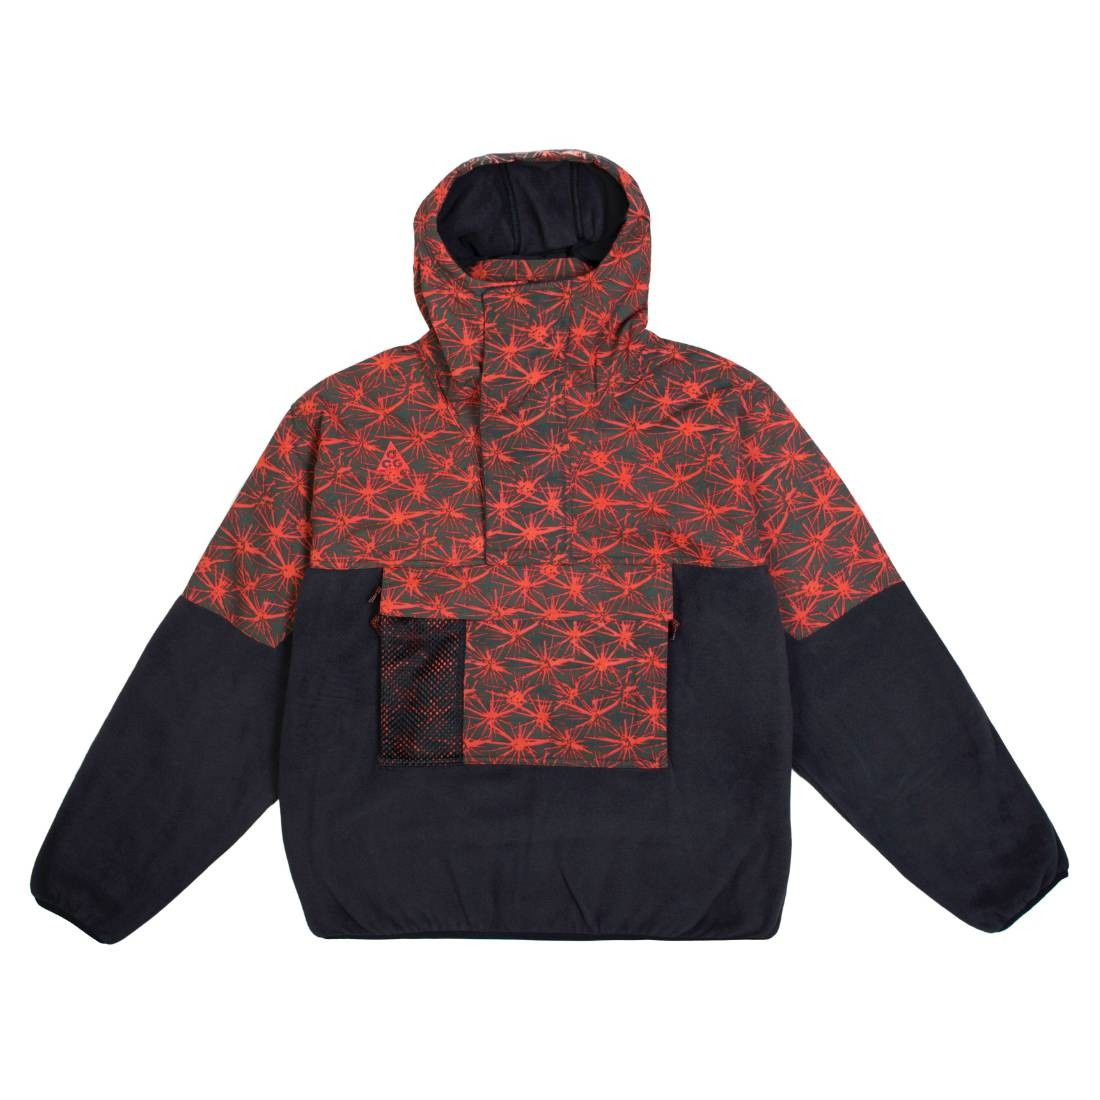 Nike Men Nrg Acg Aop Lightweight Fleece Jacket (black / rush red)